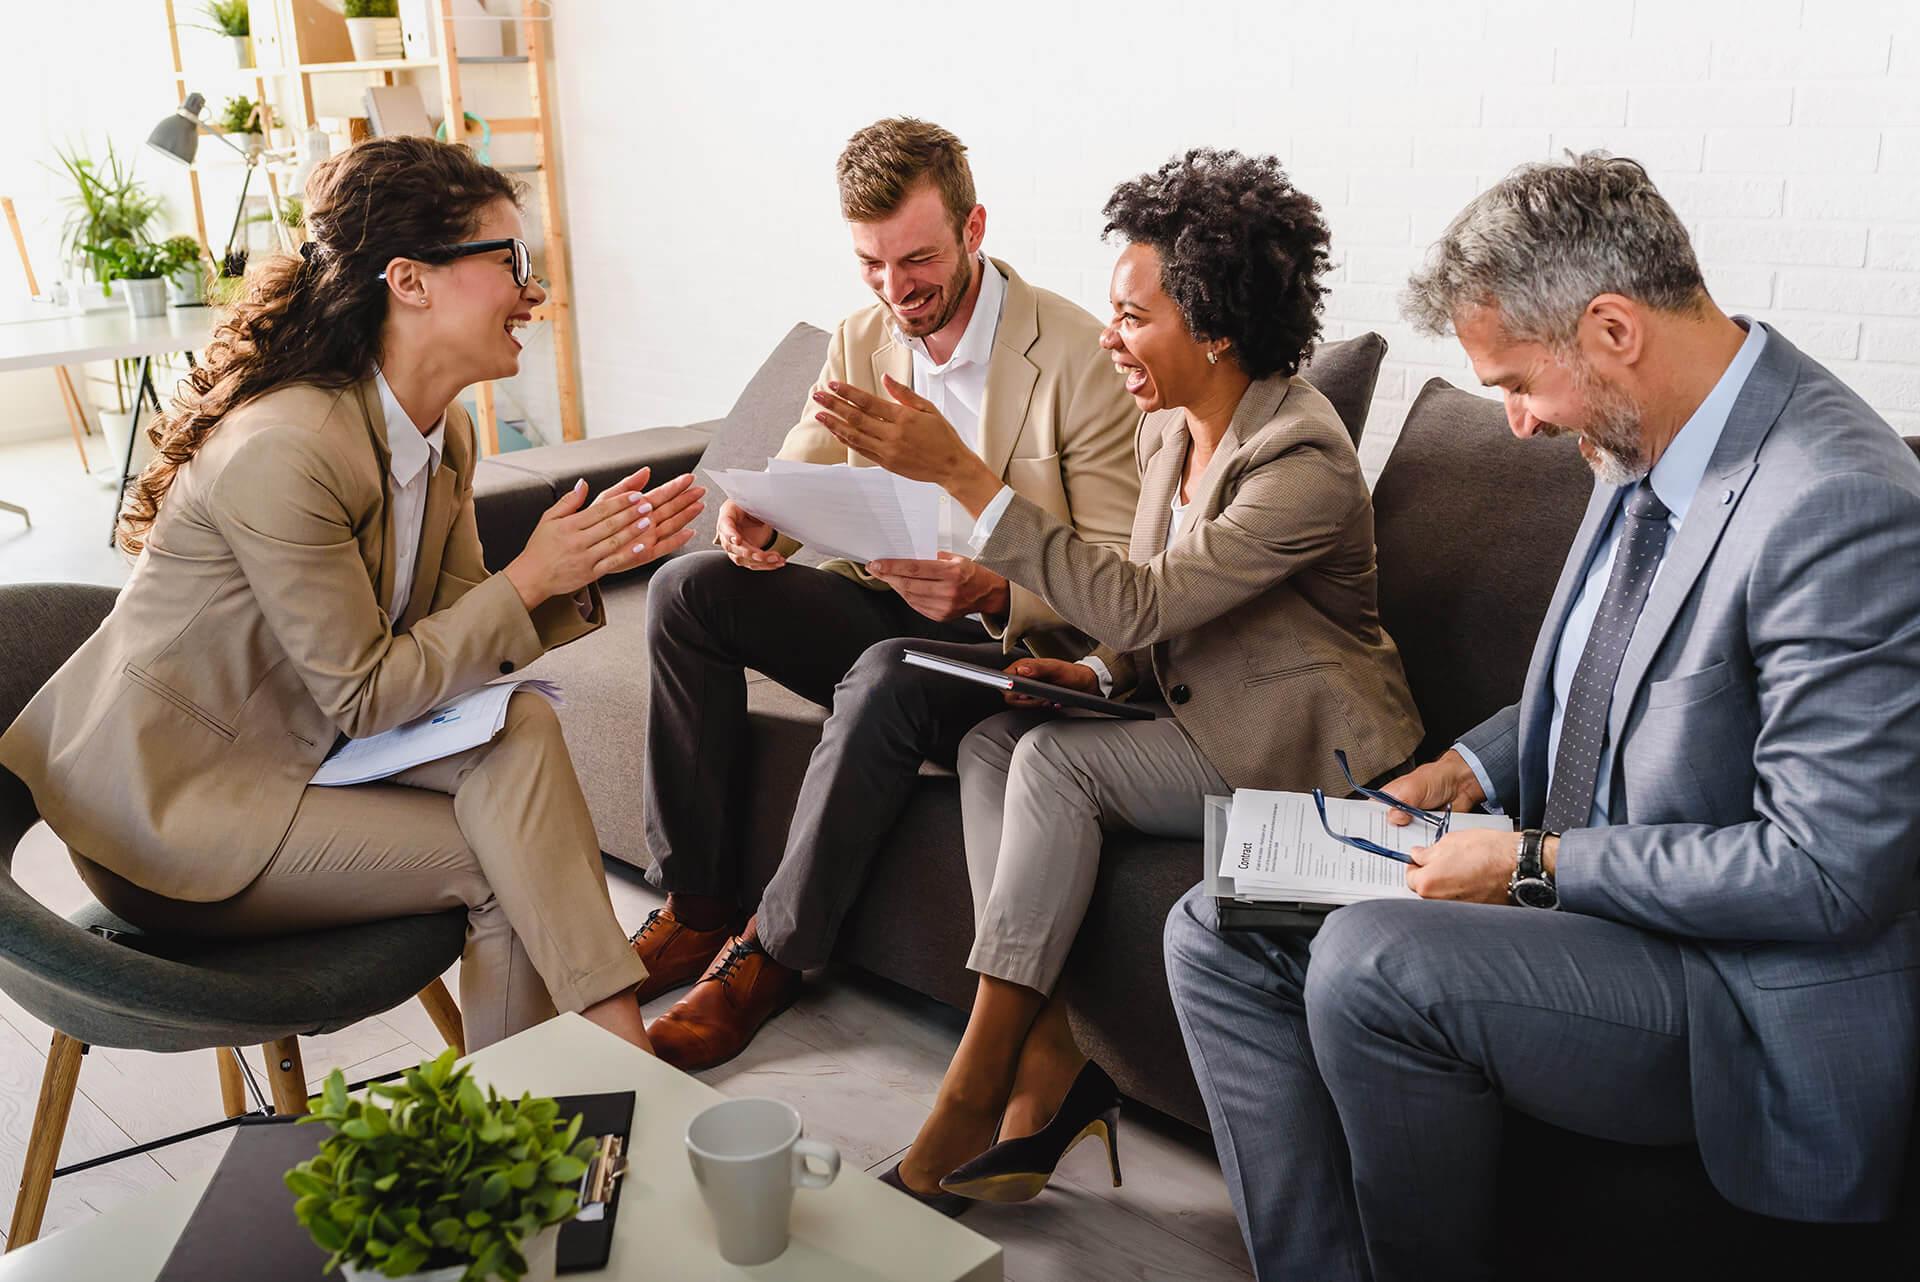 Diverse team discussing work